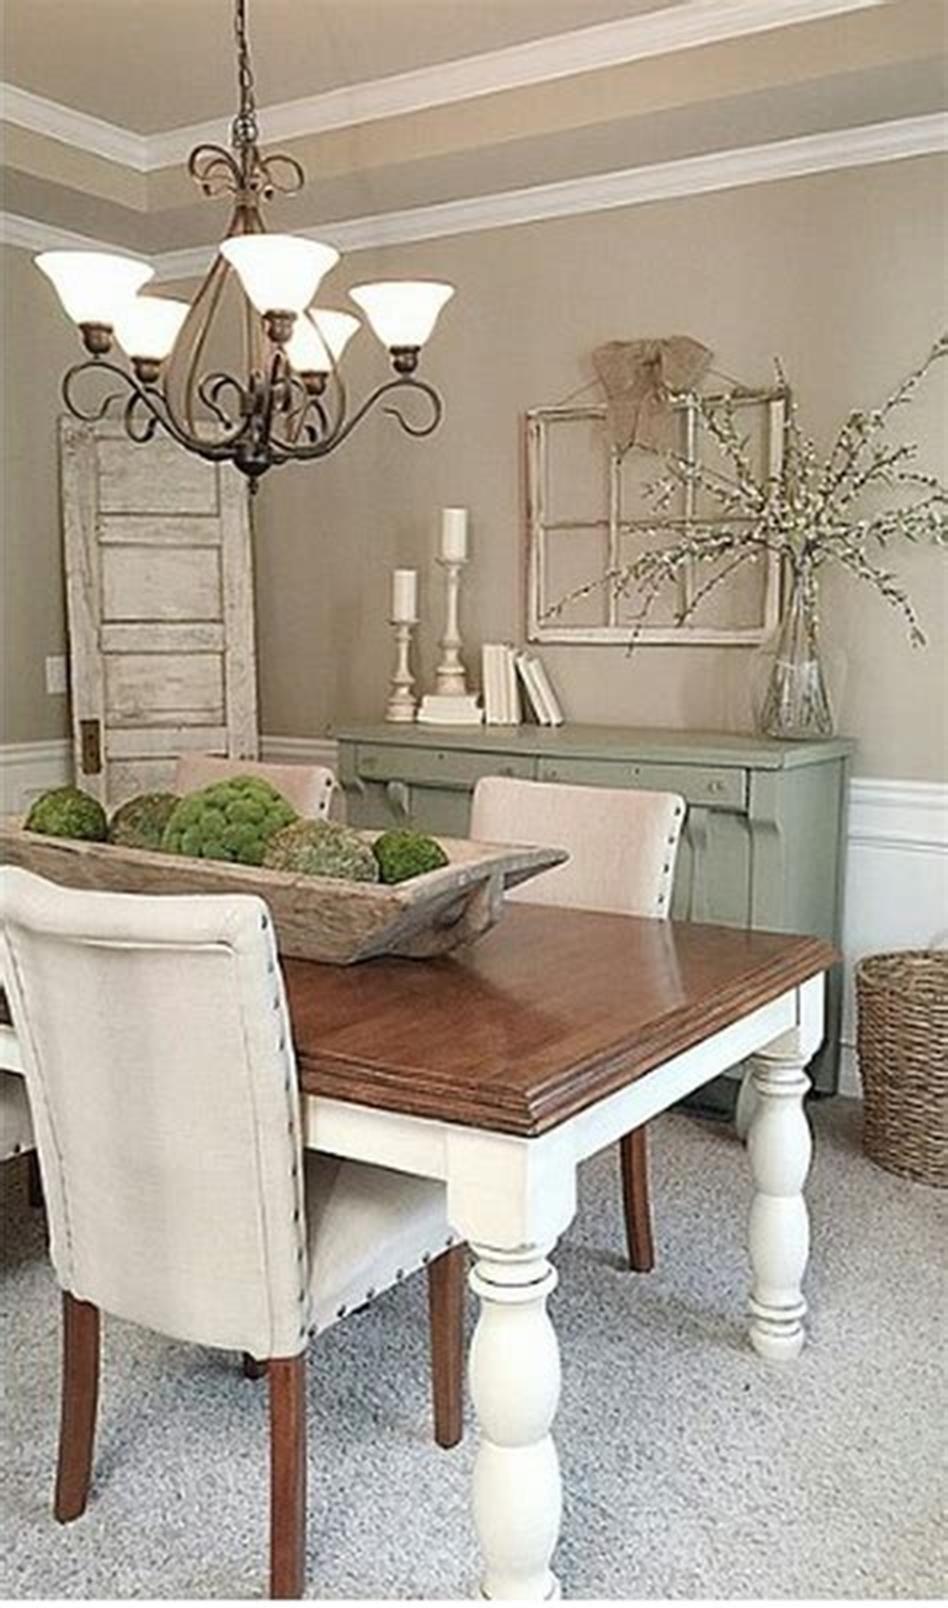 Creative Centerpiece Ideas for a Stunning Table Arrangement images